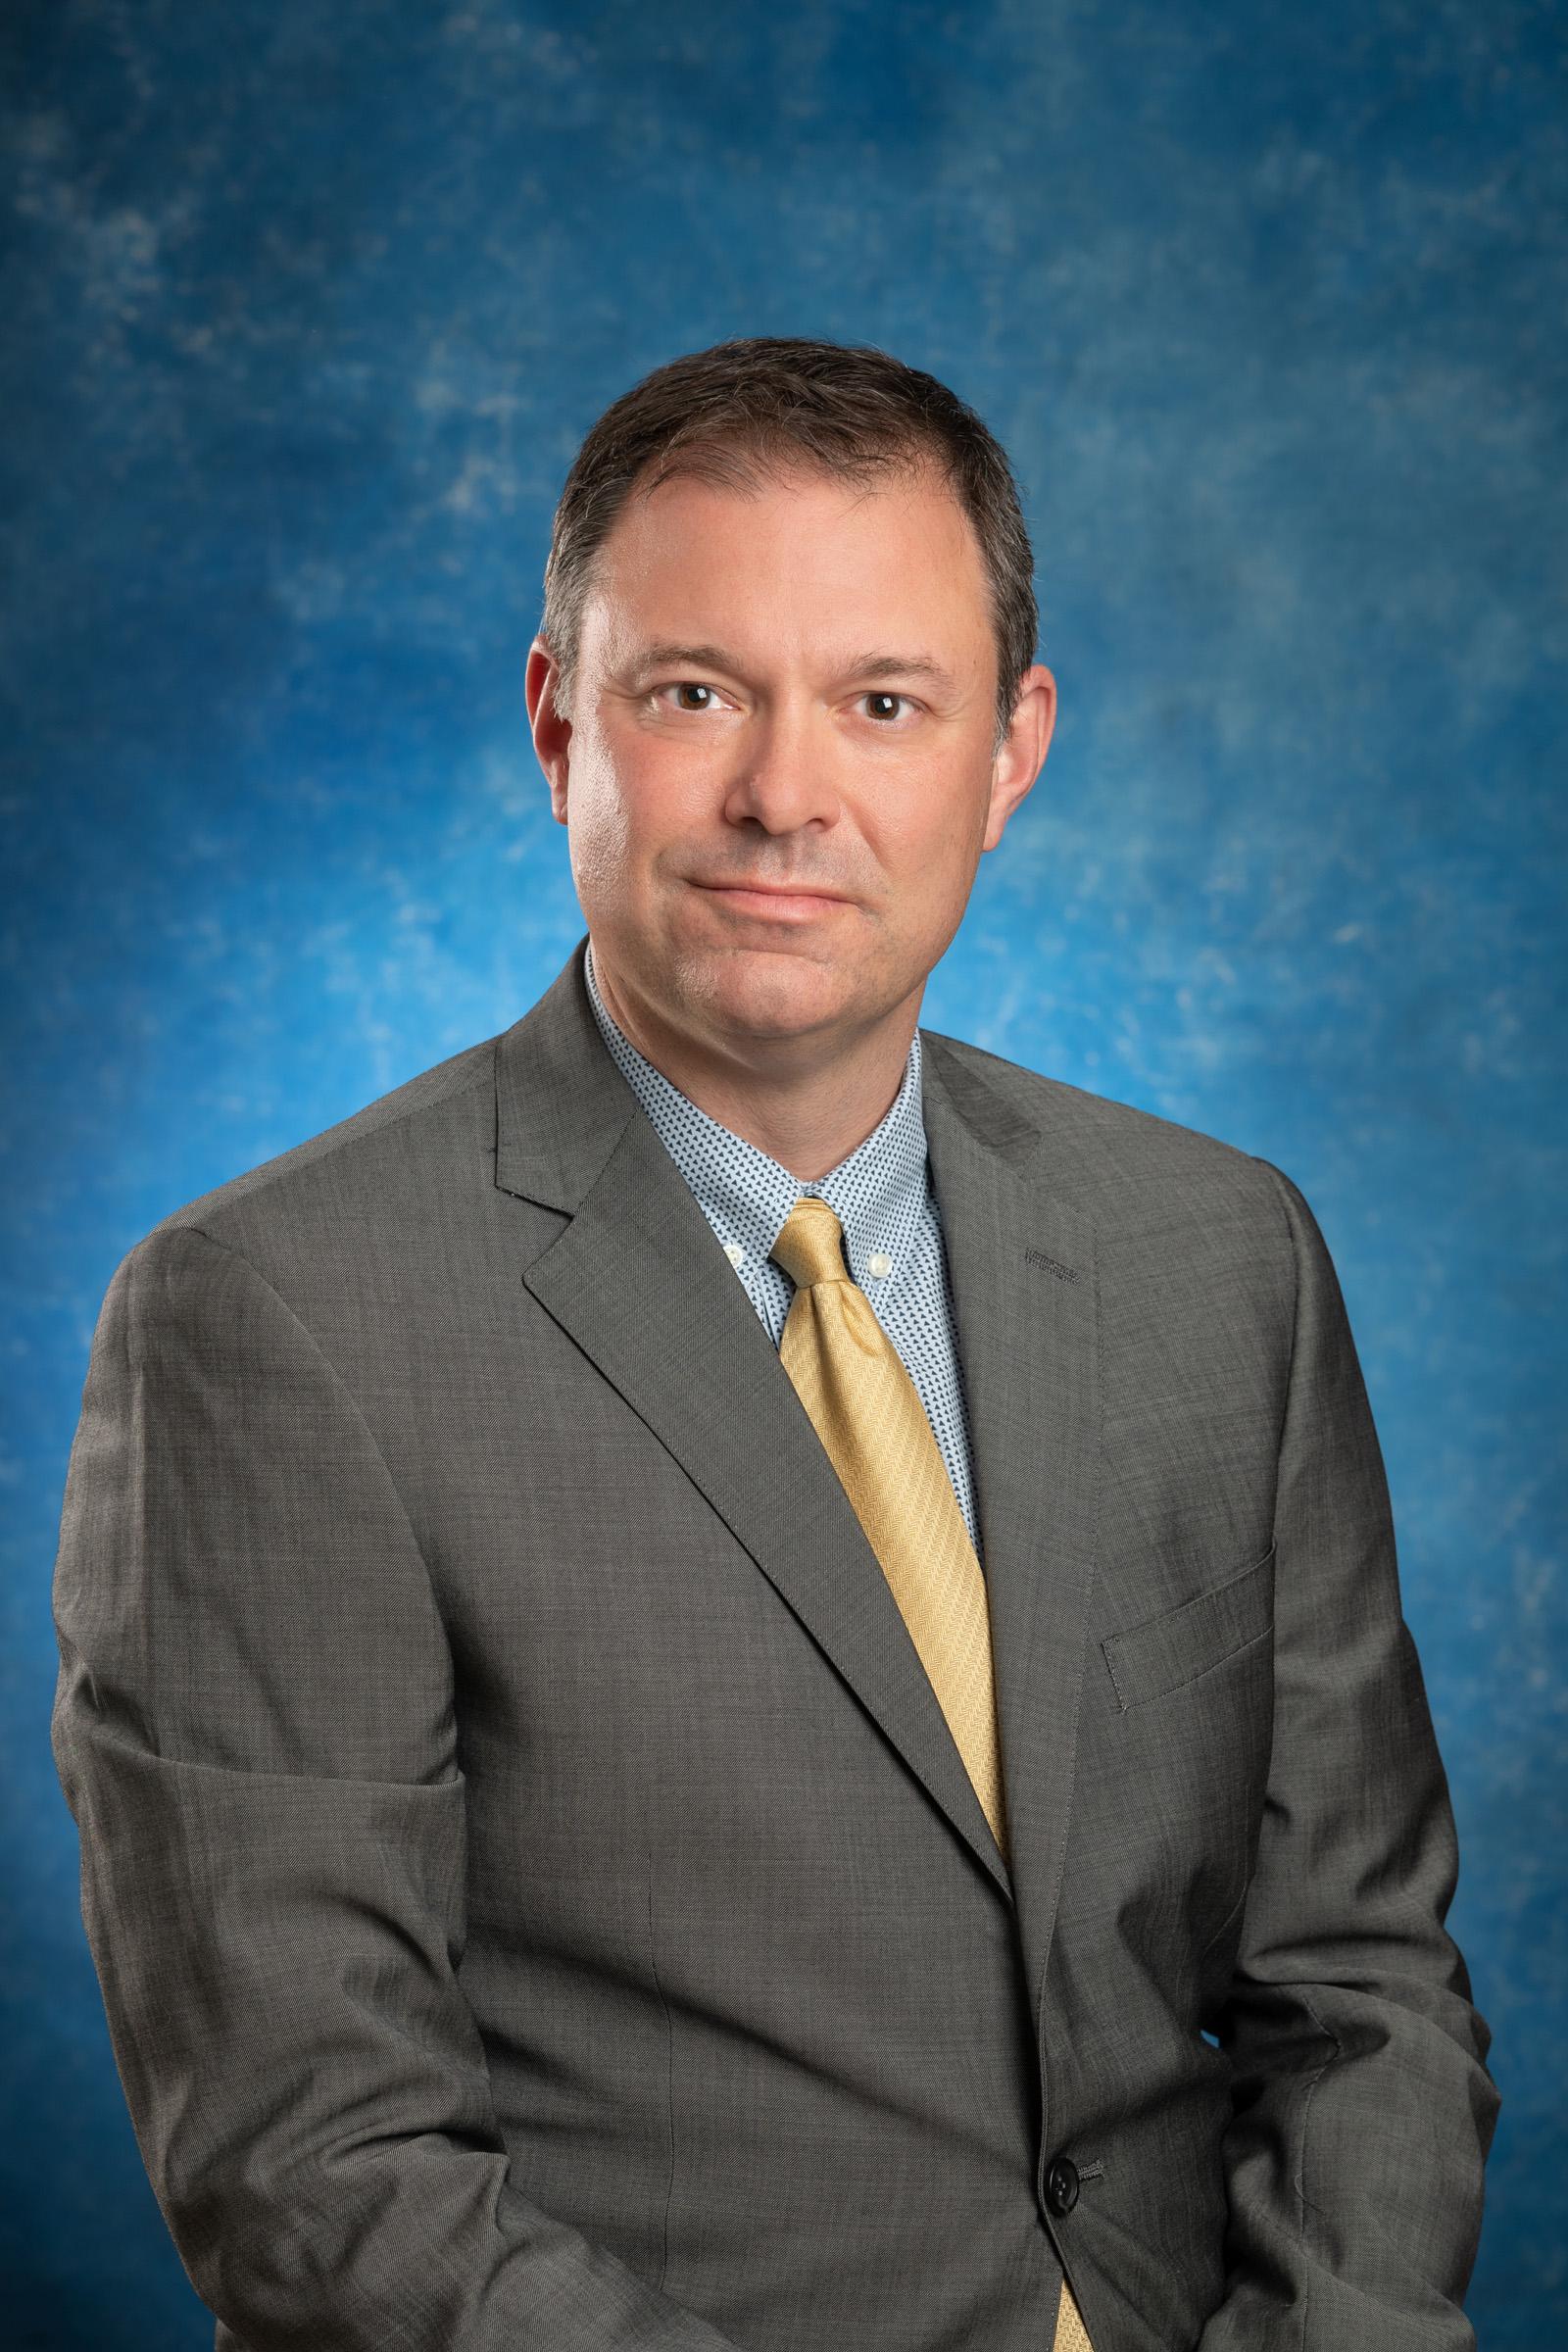 Dr. Joseph Castelli, Associates in Women's Health Care of Pueblo, Colorado